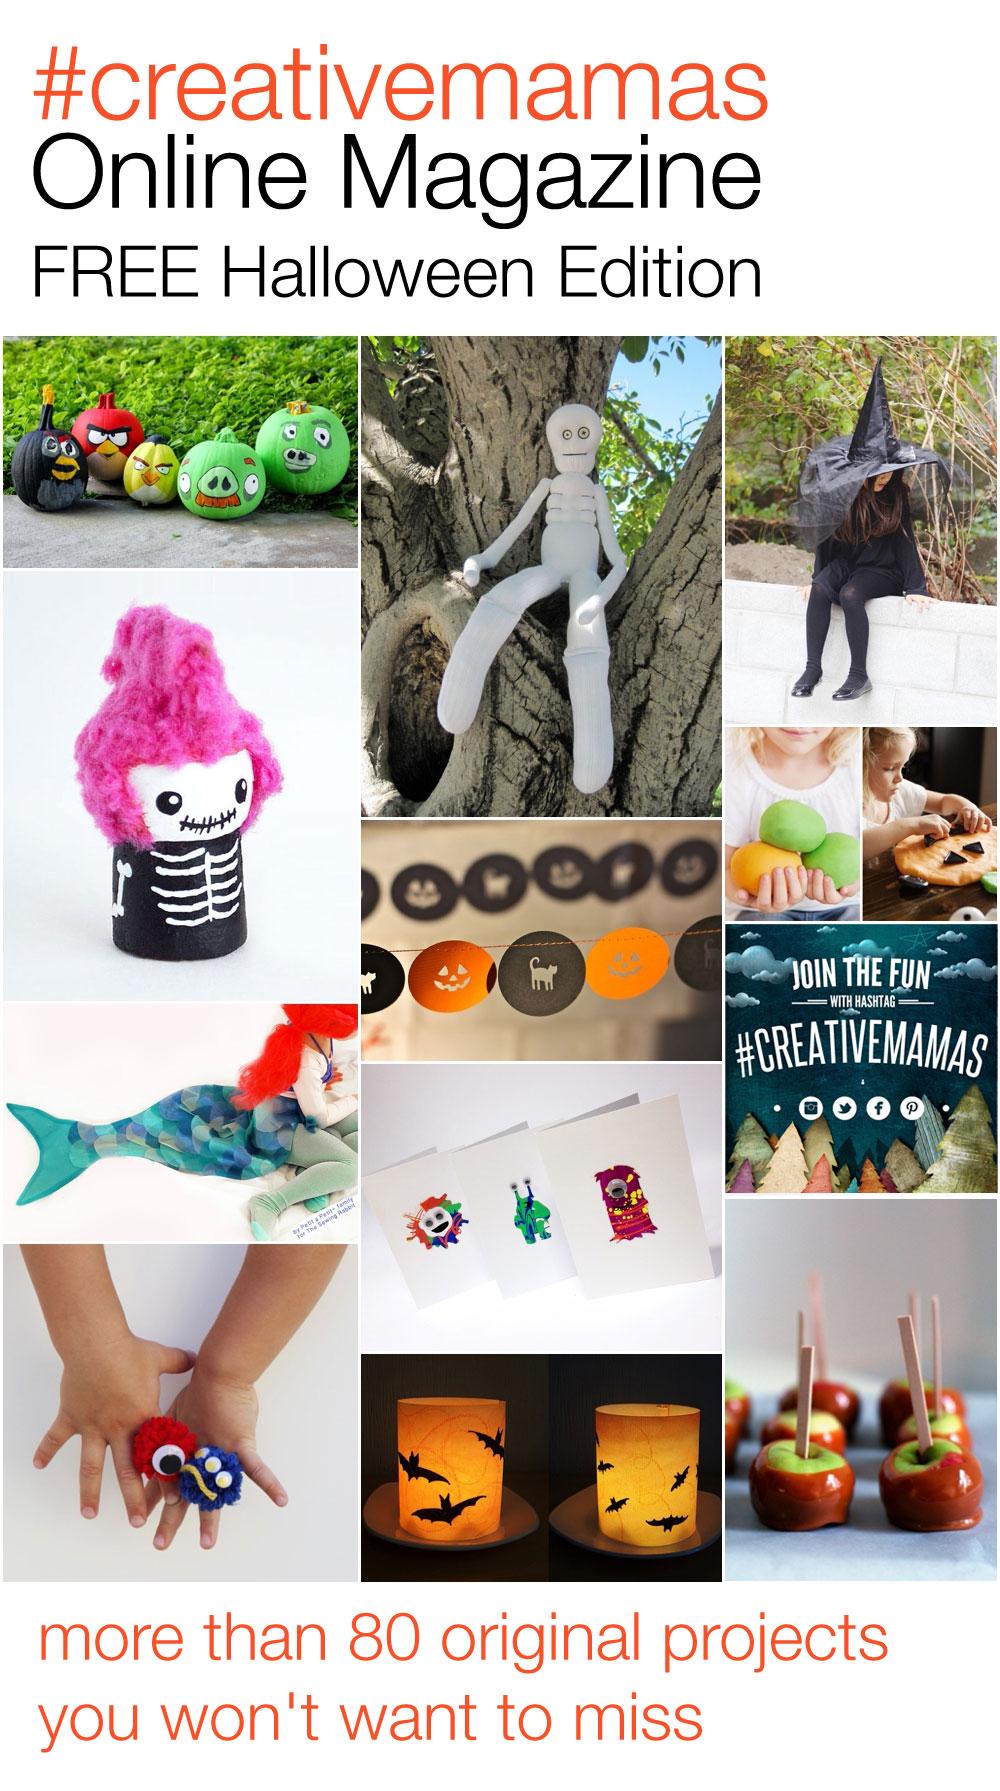 #creativemamas online magazine, halloween edition